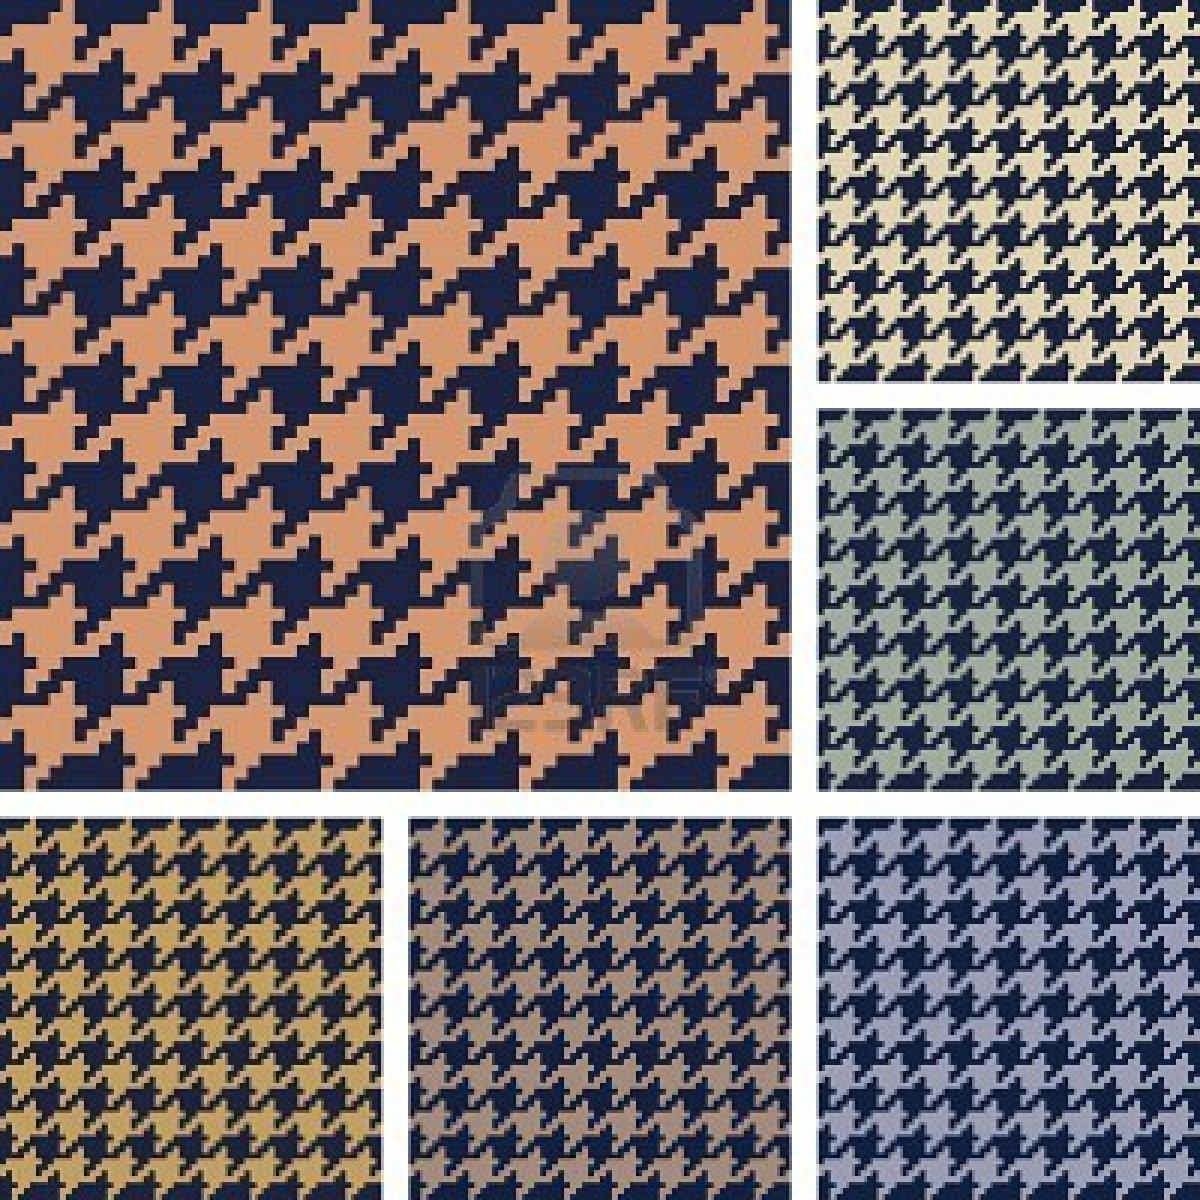 wpid-6689566-set-of-houndstooth-pattern-2011-11-28-07-01.jpg